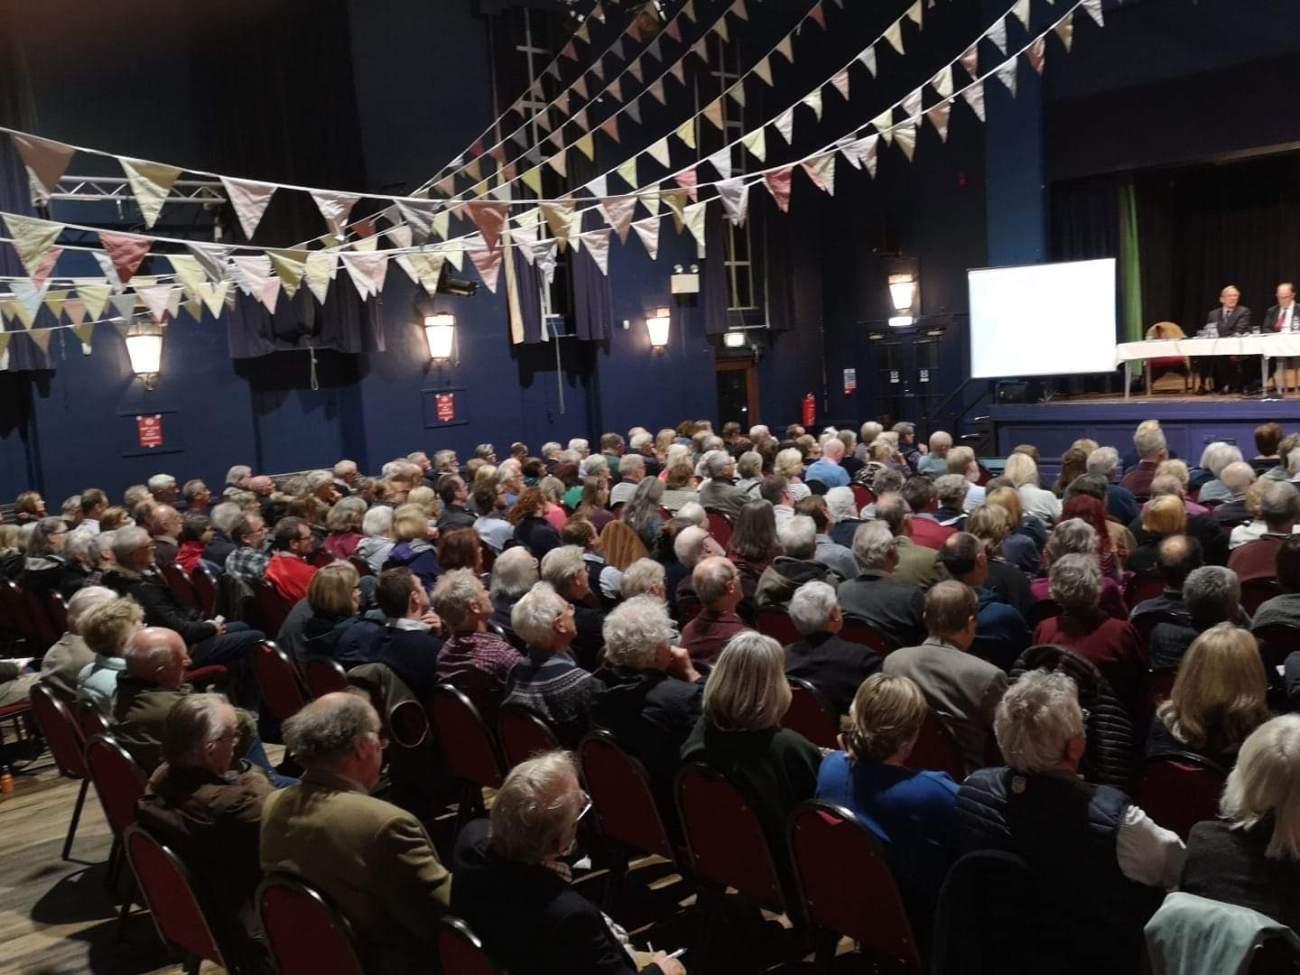 181011 Malton meeting FFU1